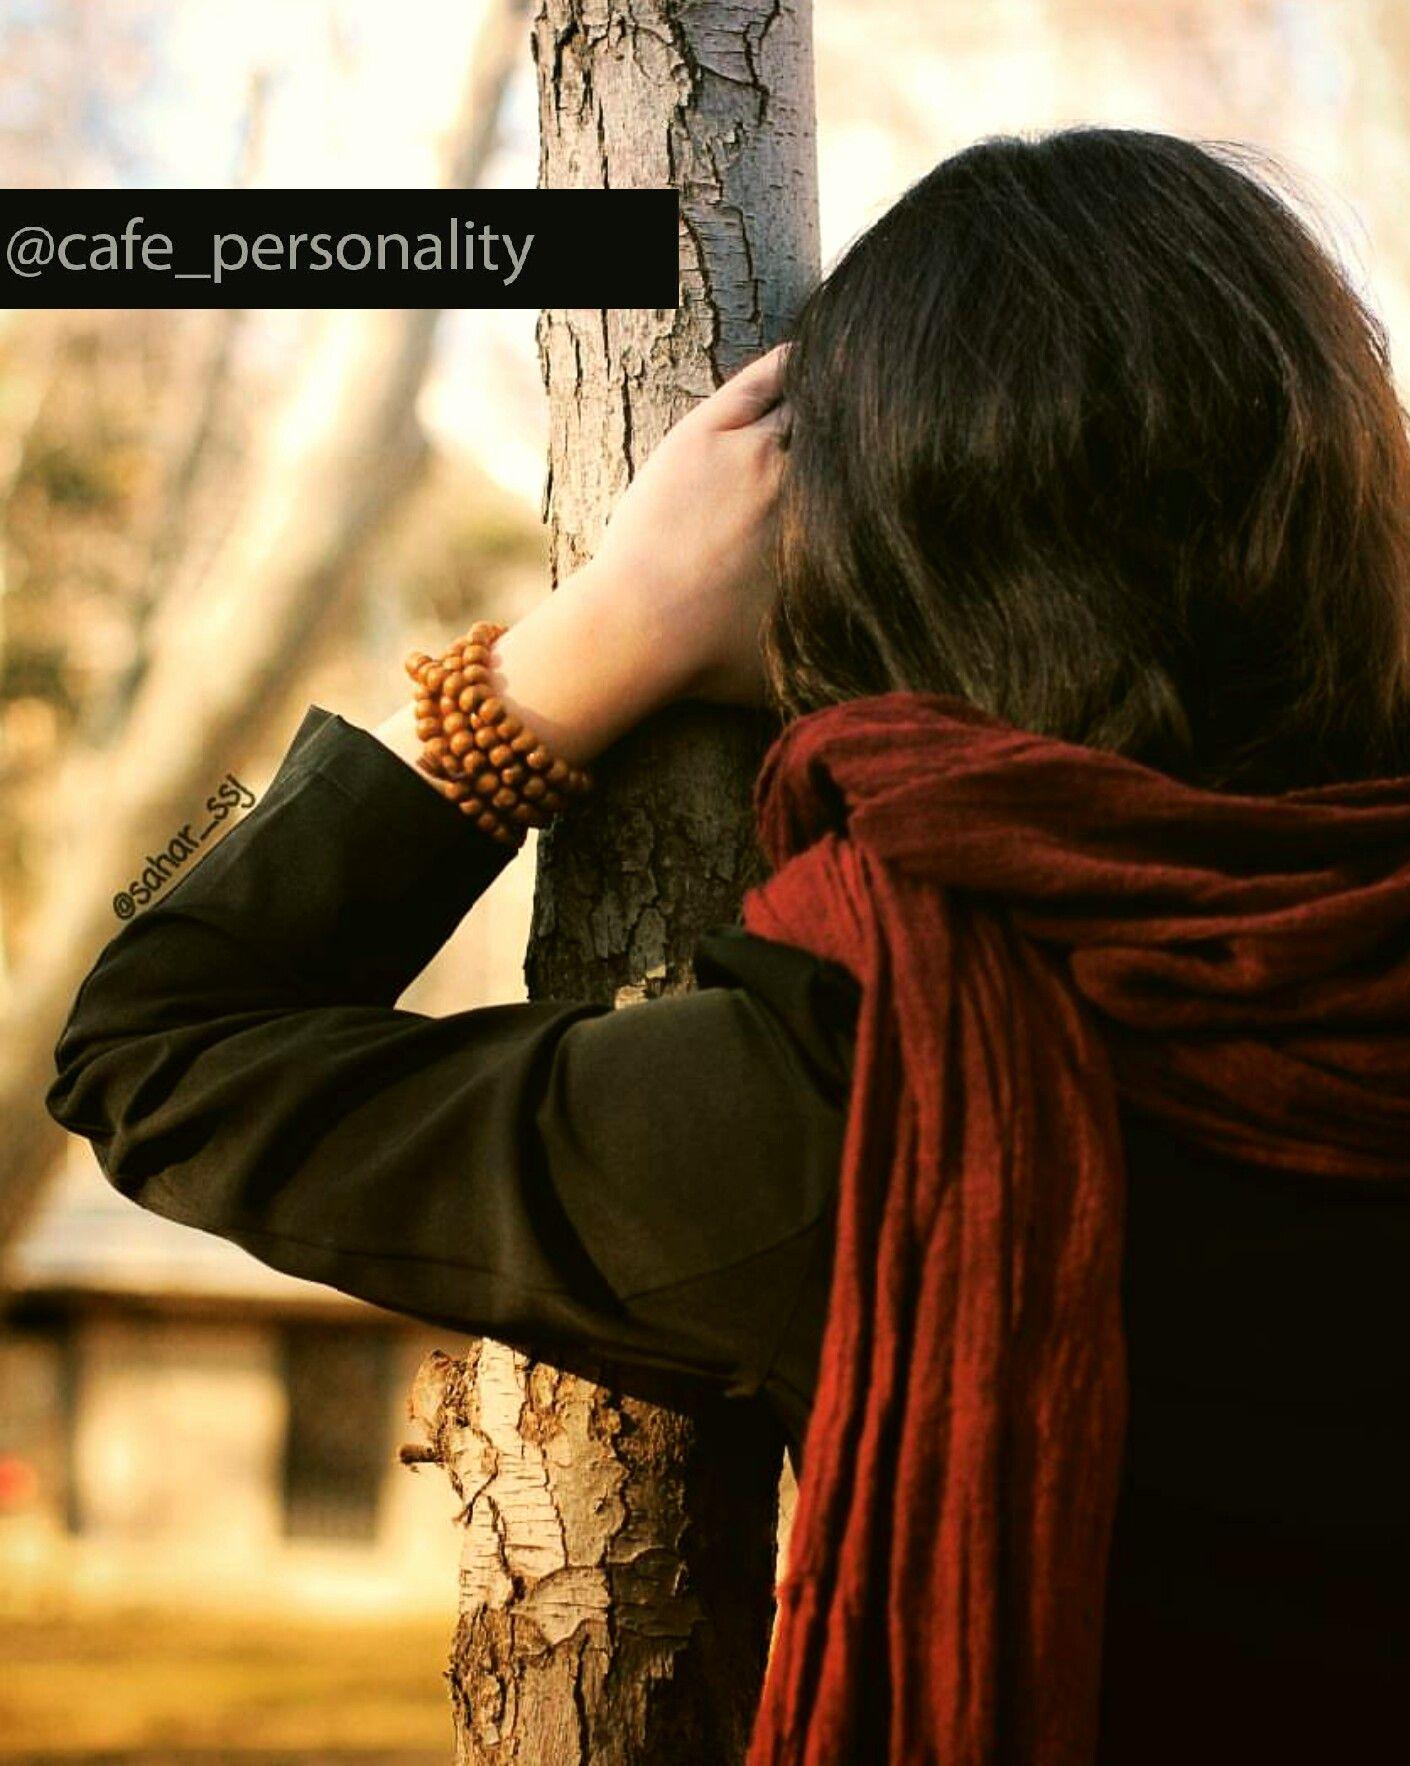 Pics stylish for sad girls new photo